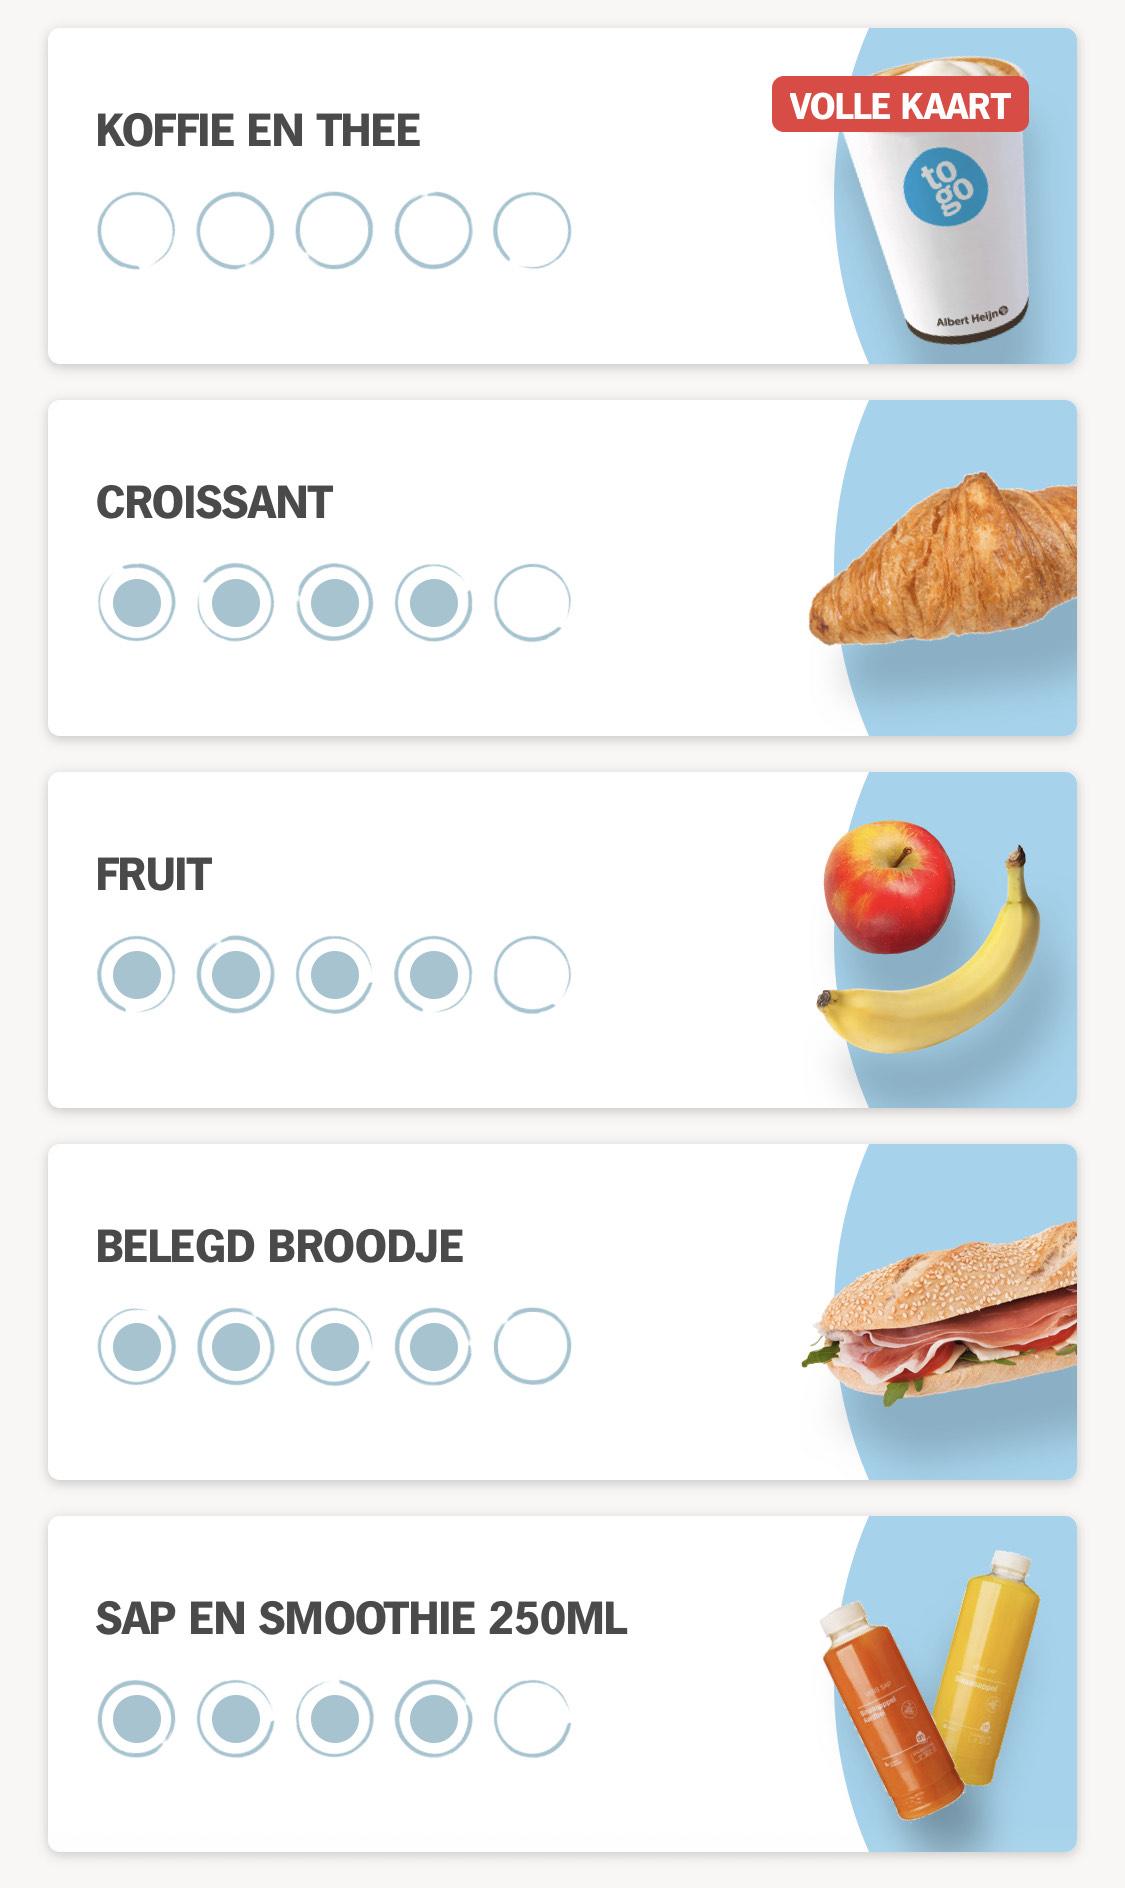 AH To Go - Gratis Koffie / Croissant / Belegd Broodje